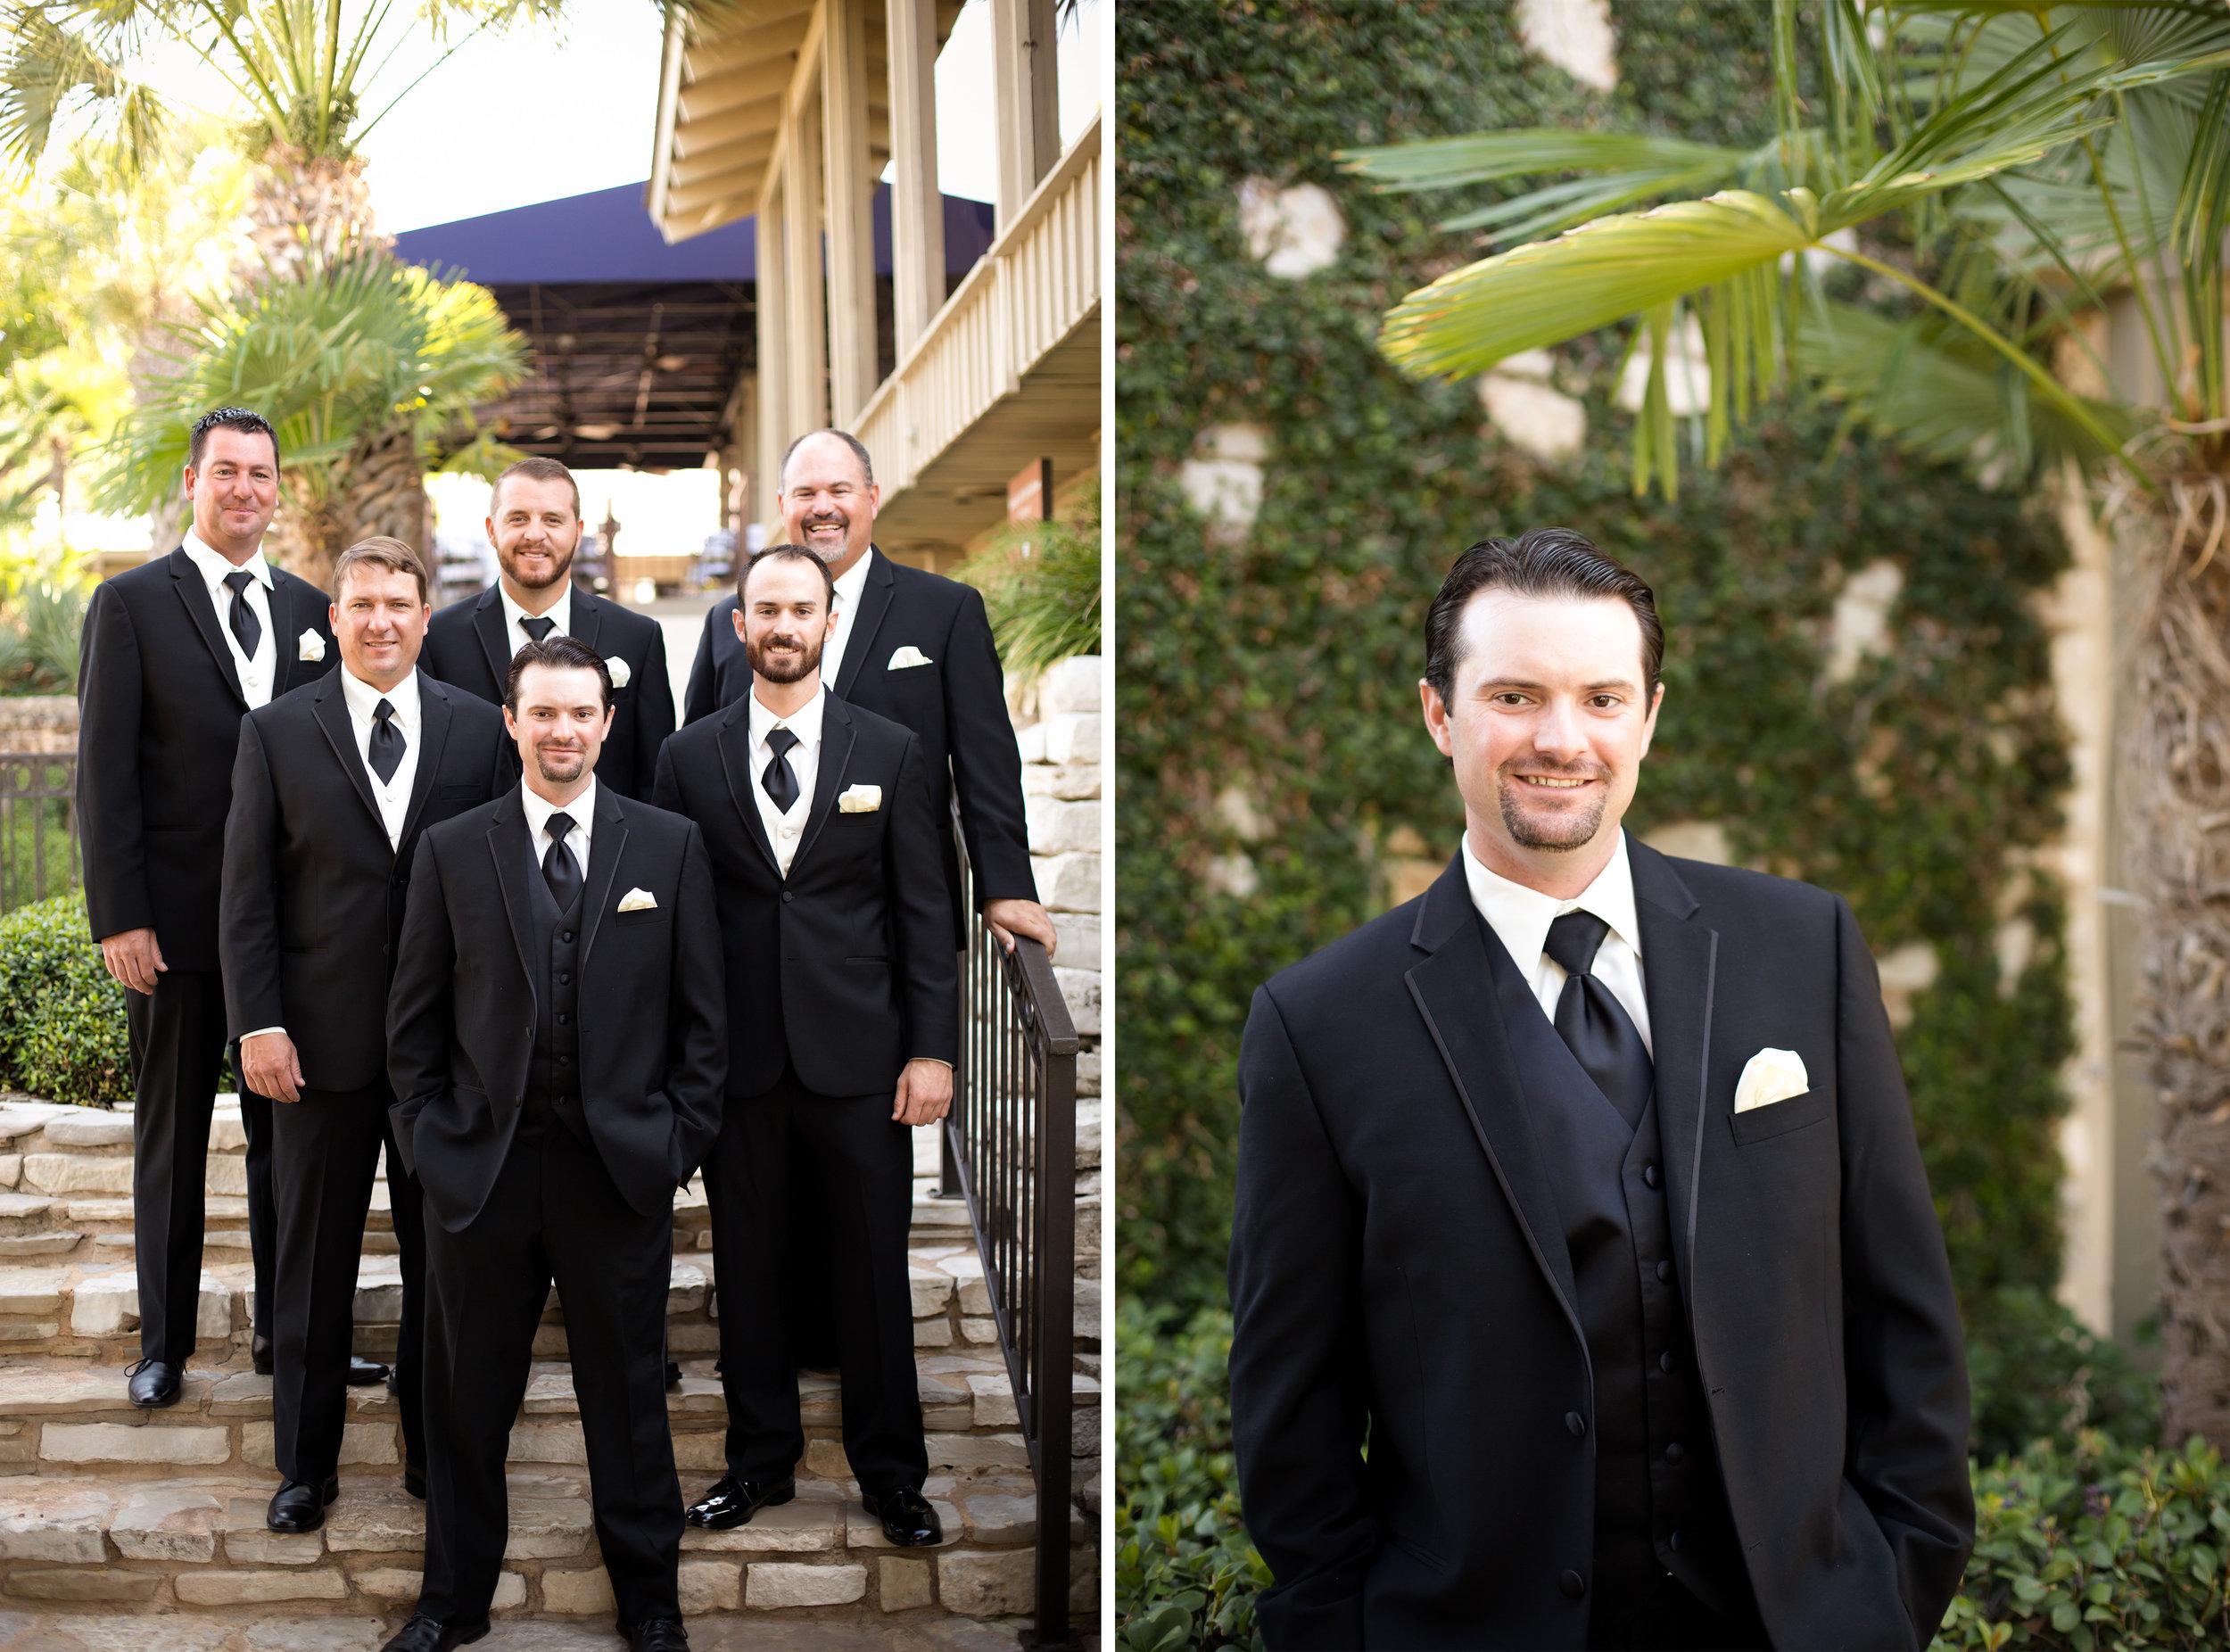 Horseshoe_Bay_Yacht_Club_Wedding_05.jpg